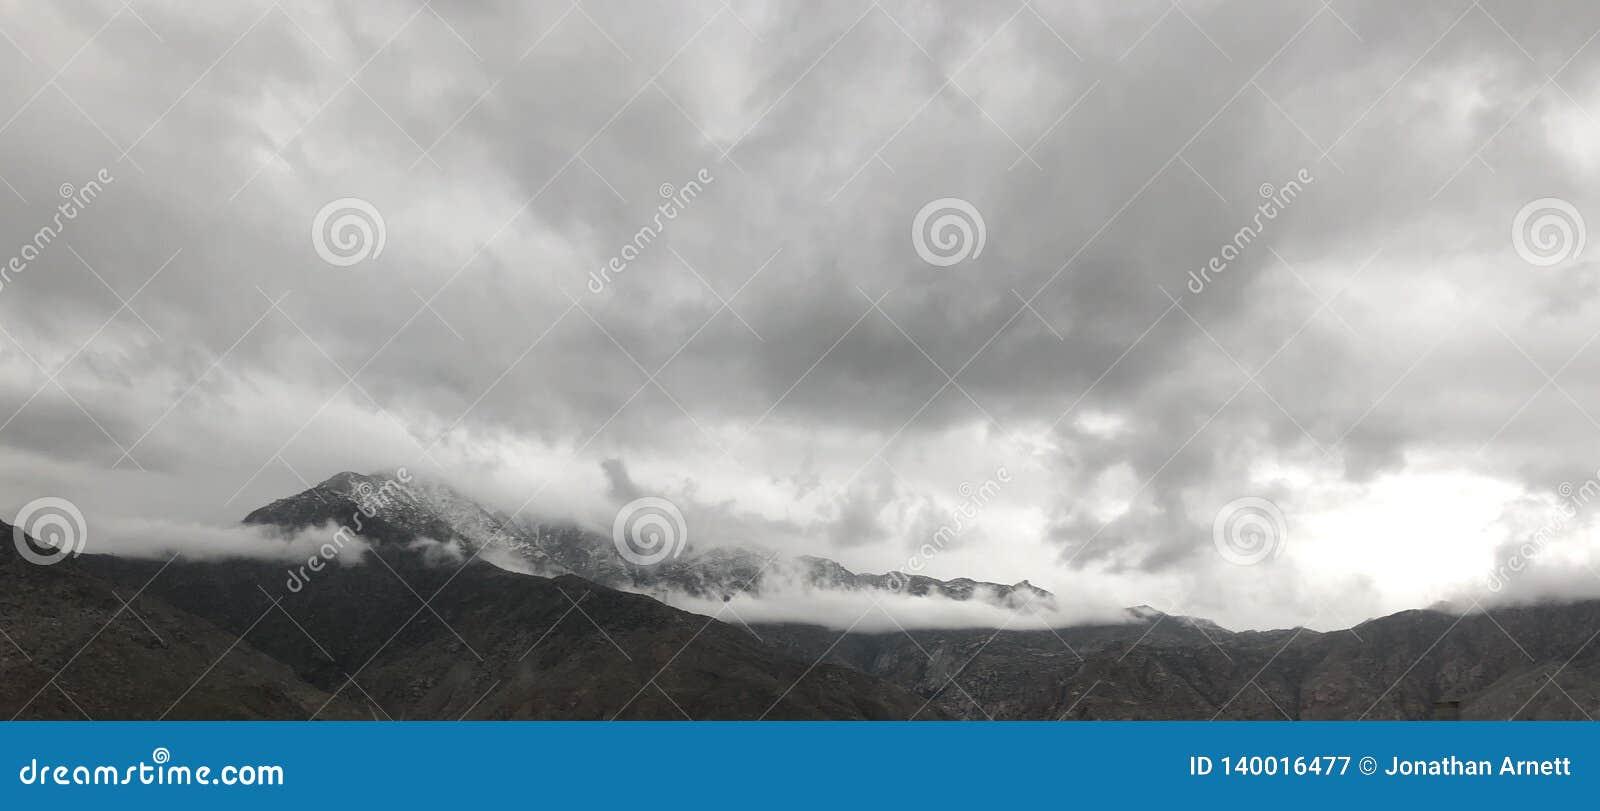 Śnieg i chmury na górze